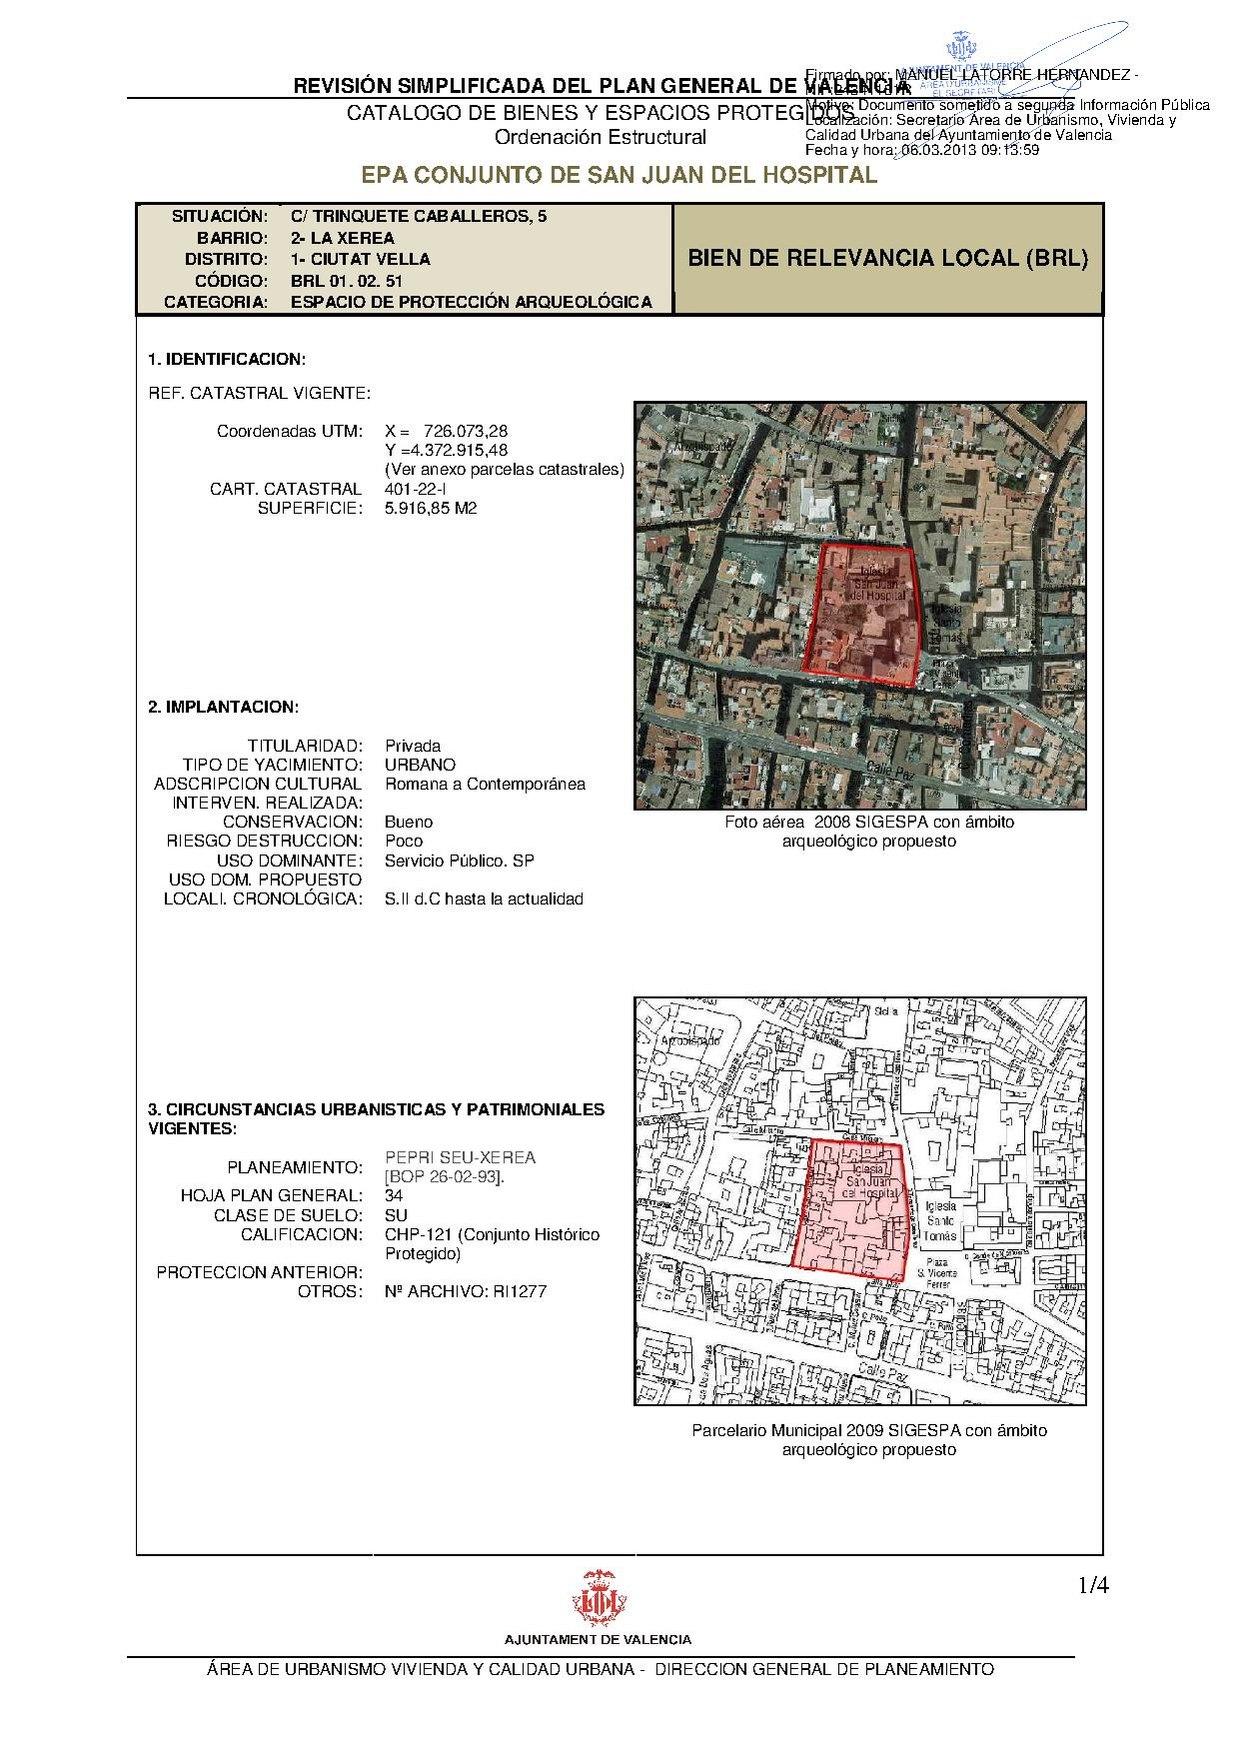 File:1 51 SAN JUAN DEL HOSPITAL firmado pdf - Wikimedia Commons